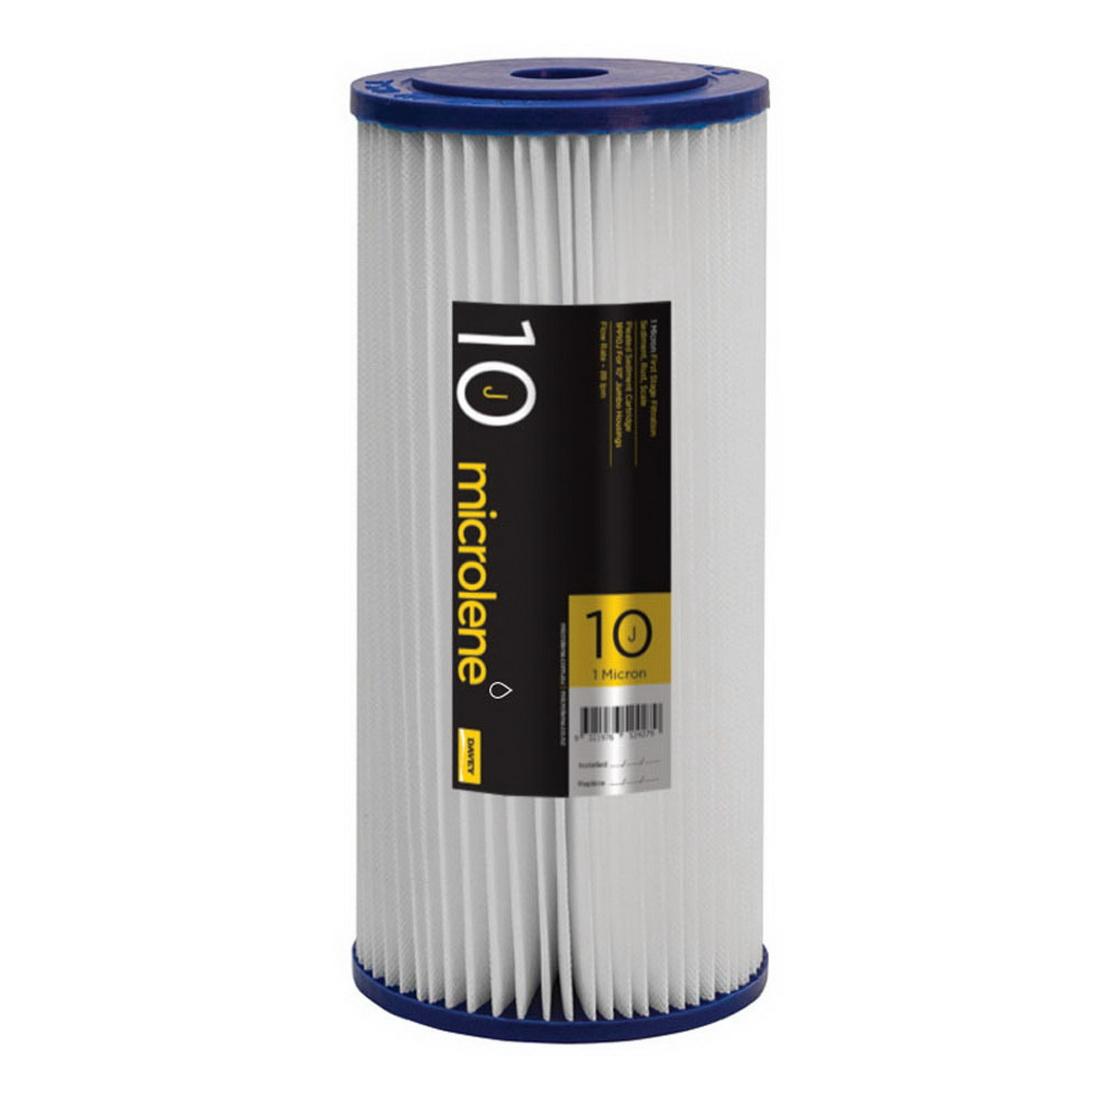 Davey Filterpure Microlene Cartridge 88 l/min 1 micron Pleated Polyester 1PP10J